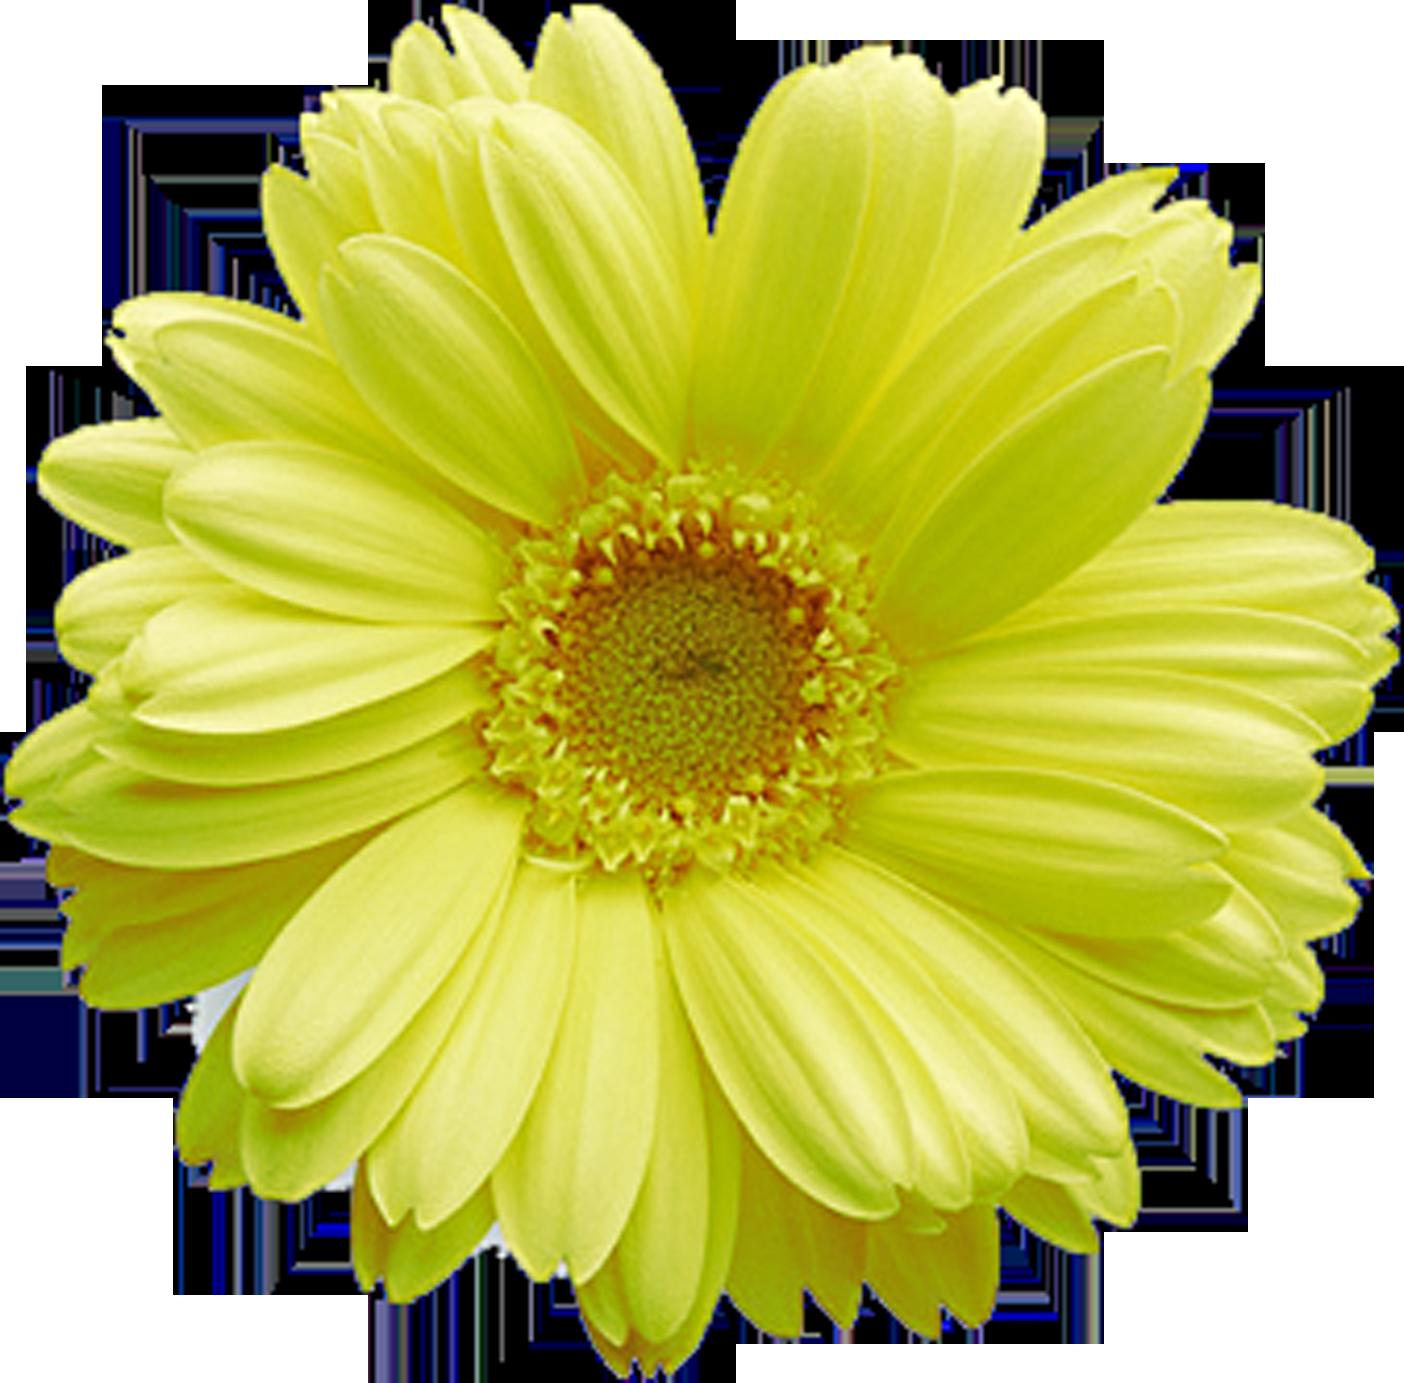 Flower Wallpaper Daisy Stems Blossoms Home Posts Trunks Flowers Messages